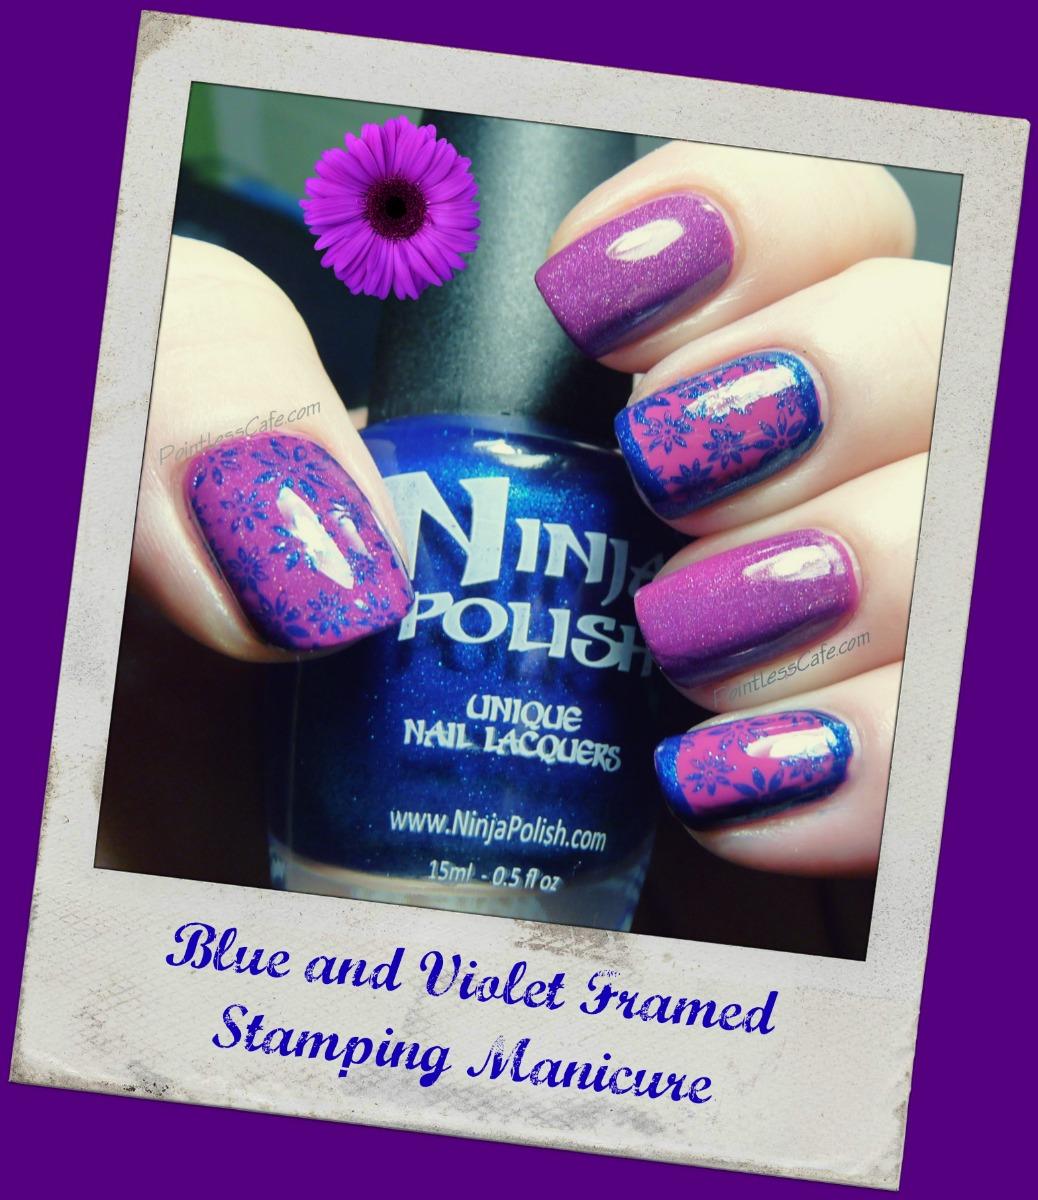 Random Monday Nail Art - A franken, framed nails and stamping ...